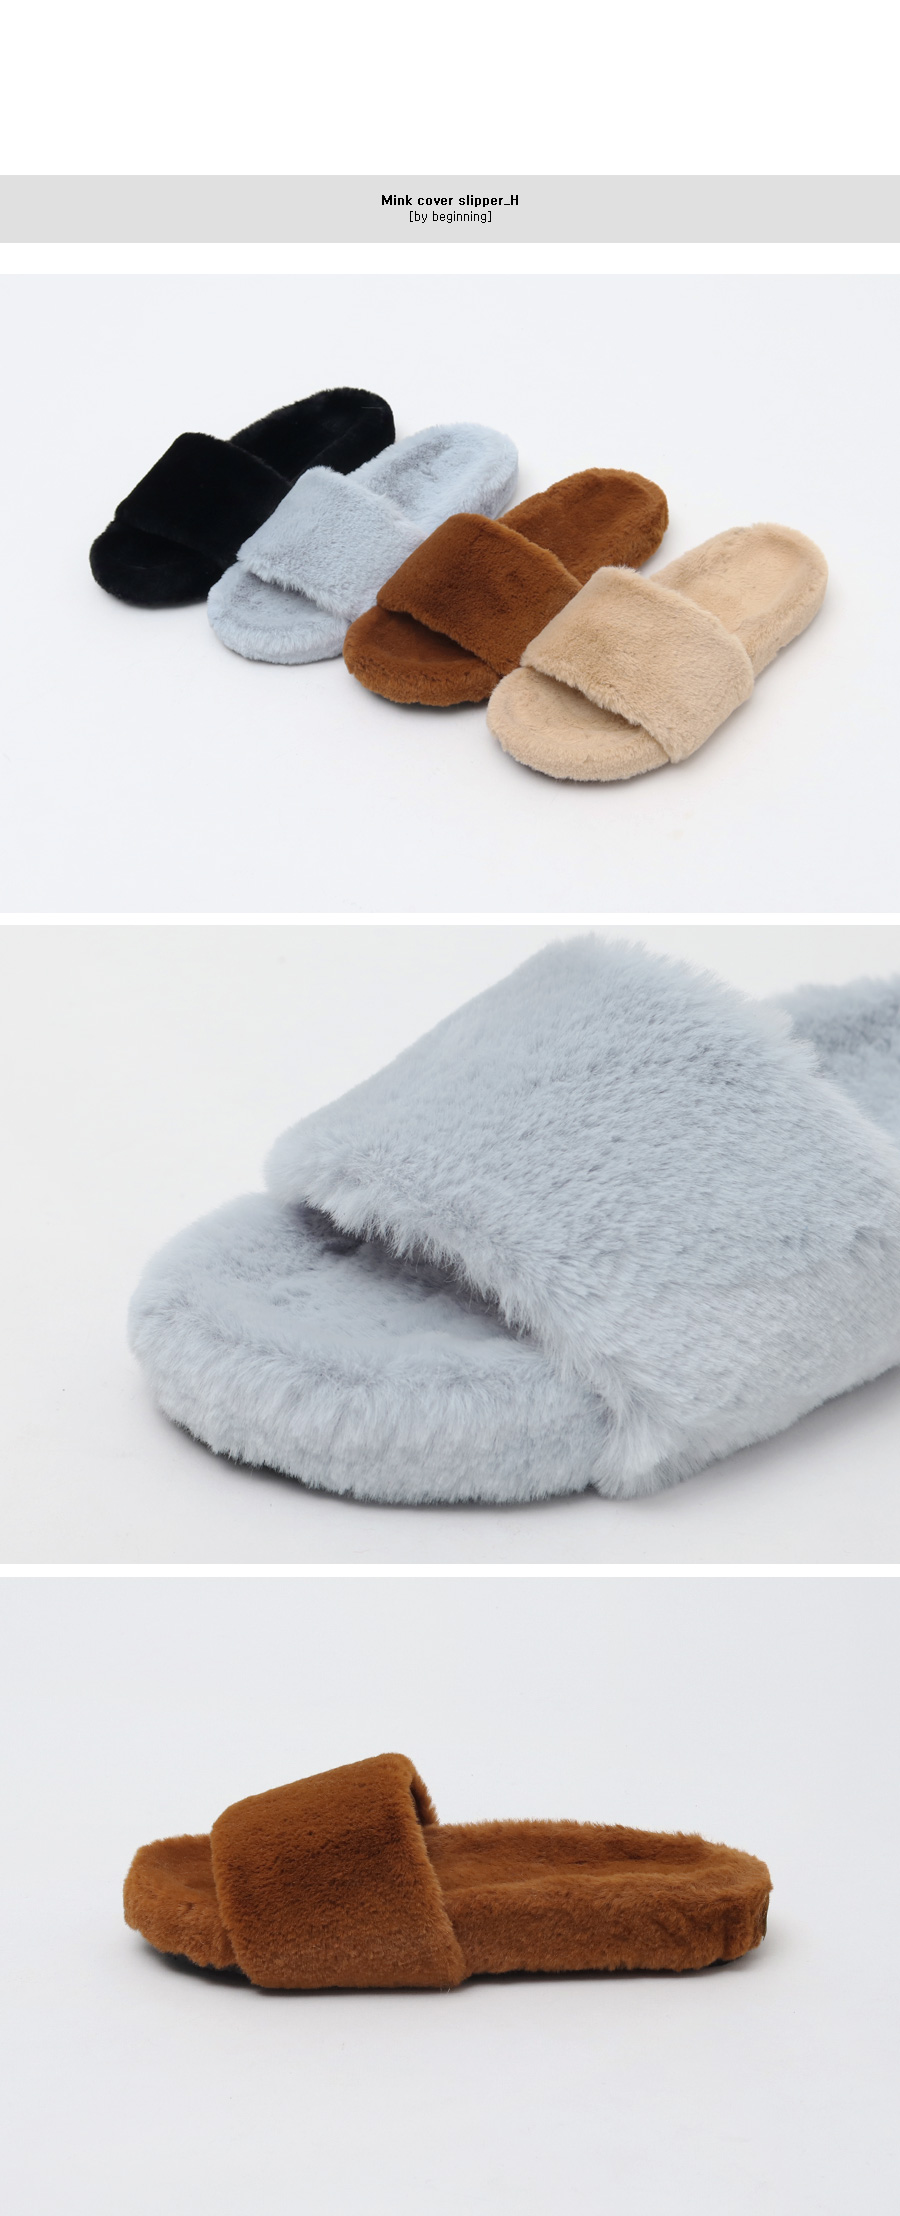 Mink cover slipper_H (size : 230,235,240,245,250)